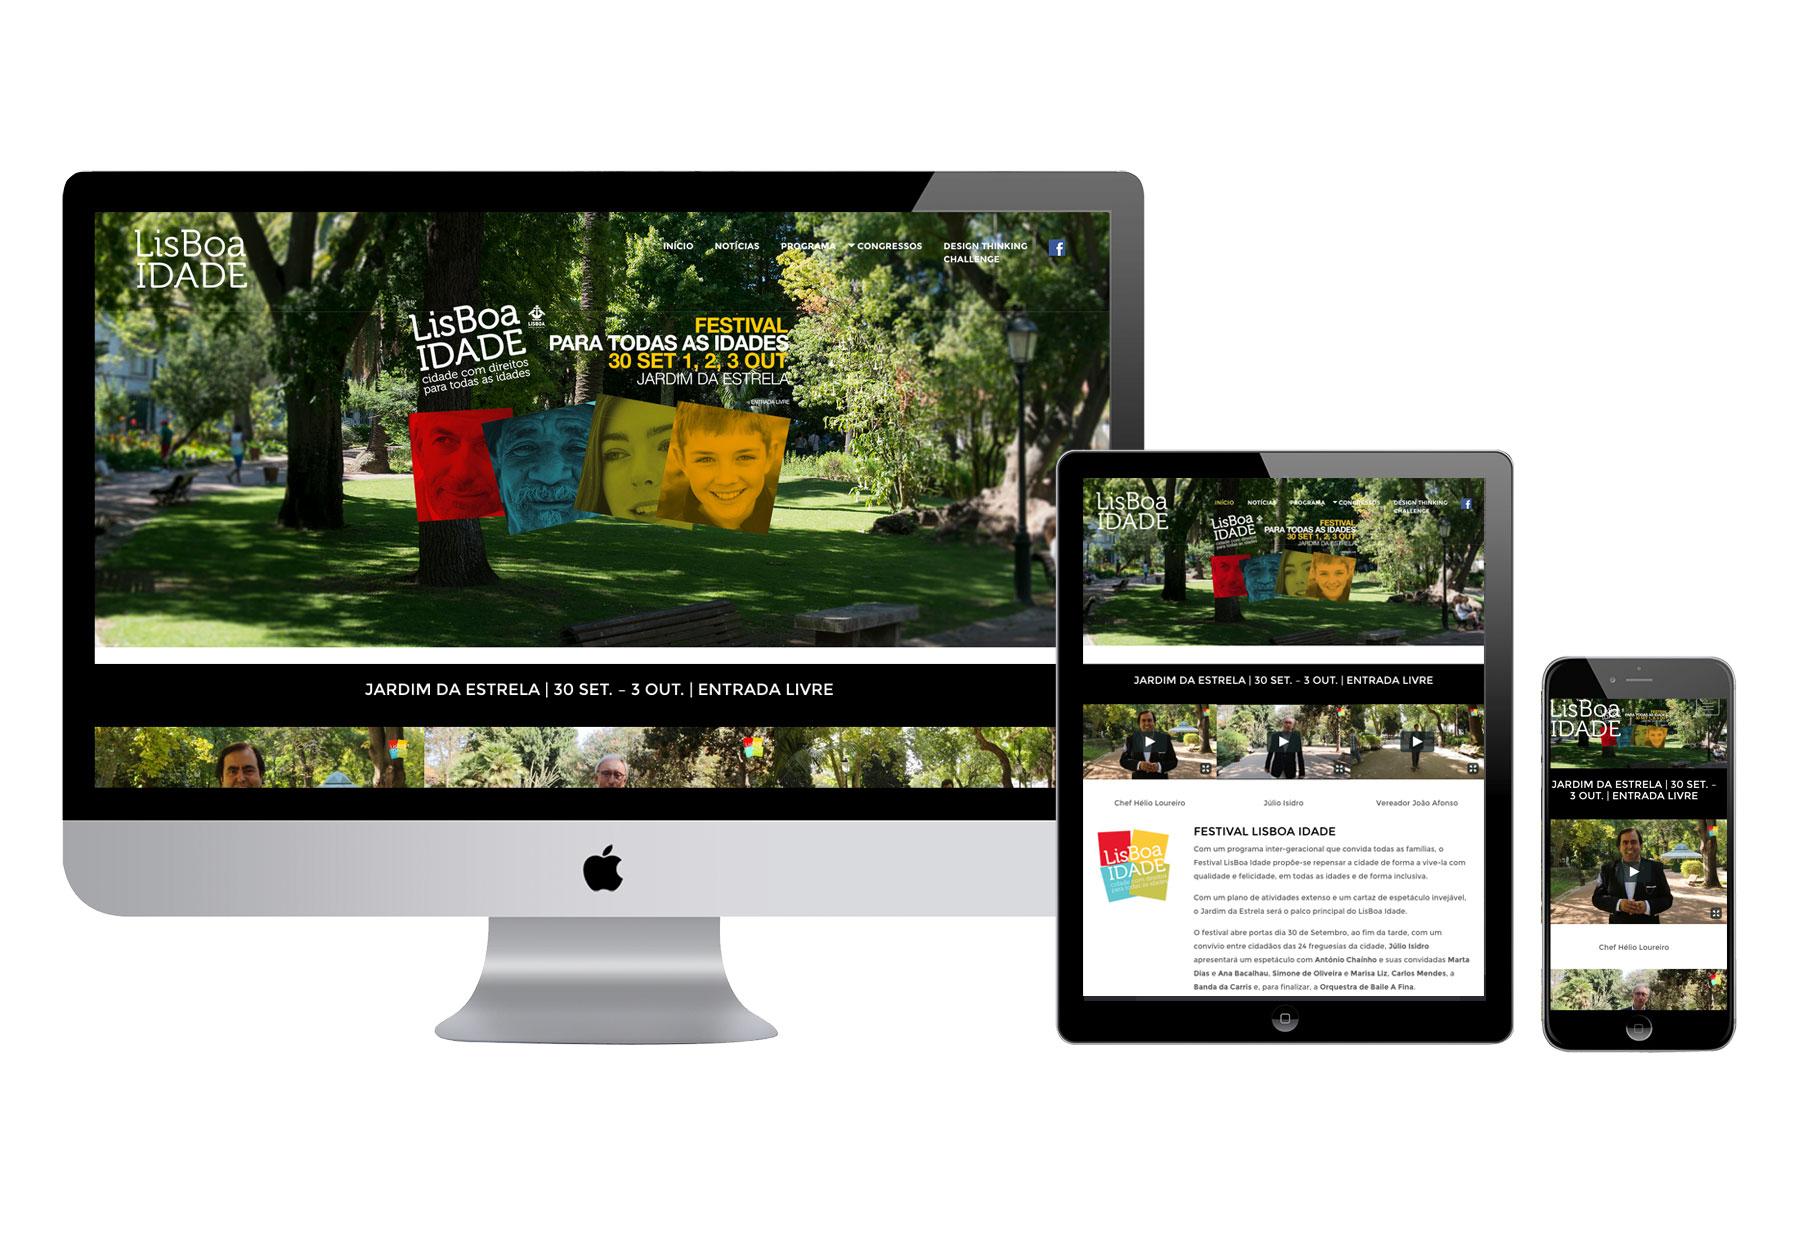 Festival LisboaIdade 2016 - site